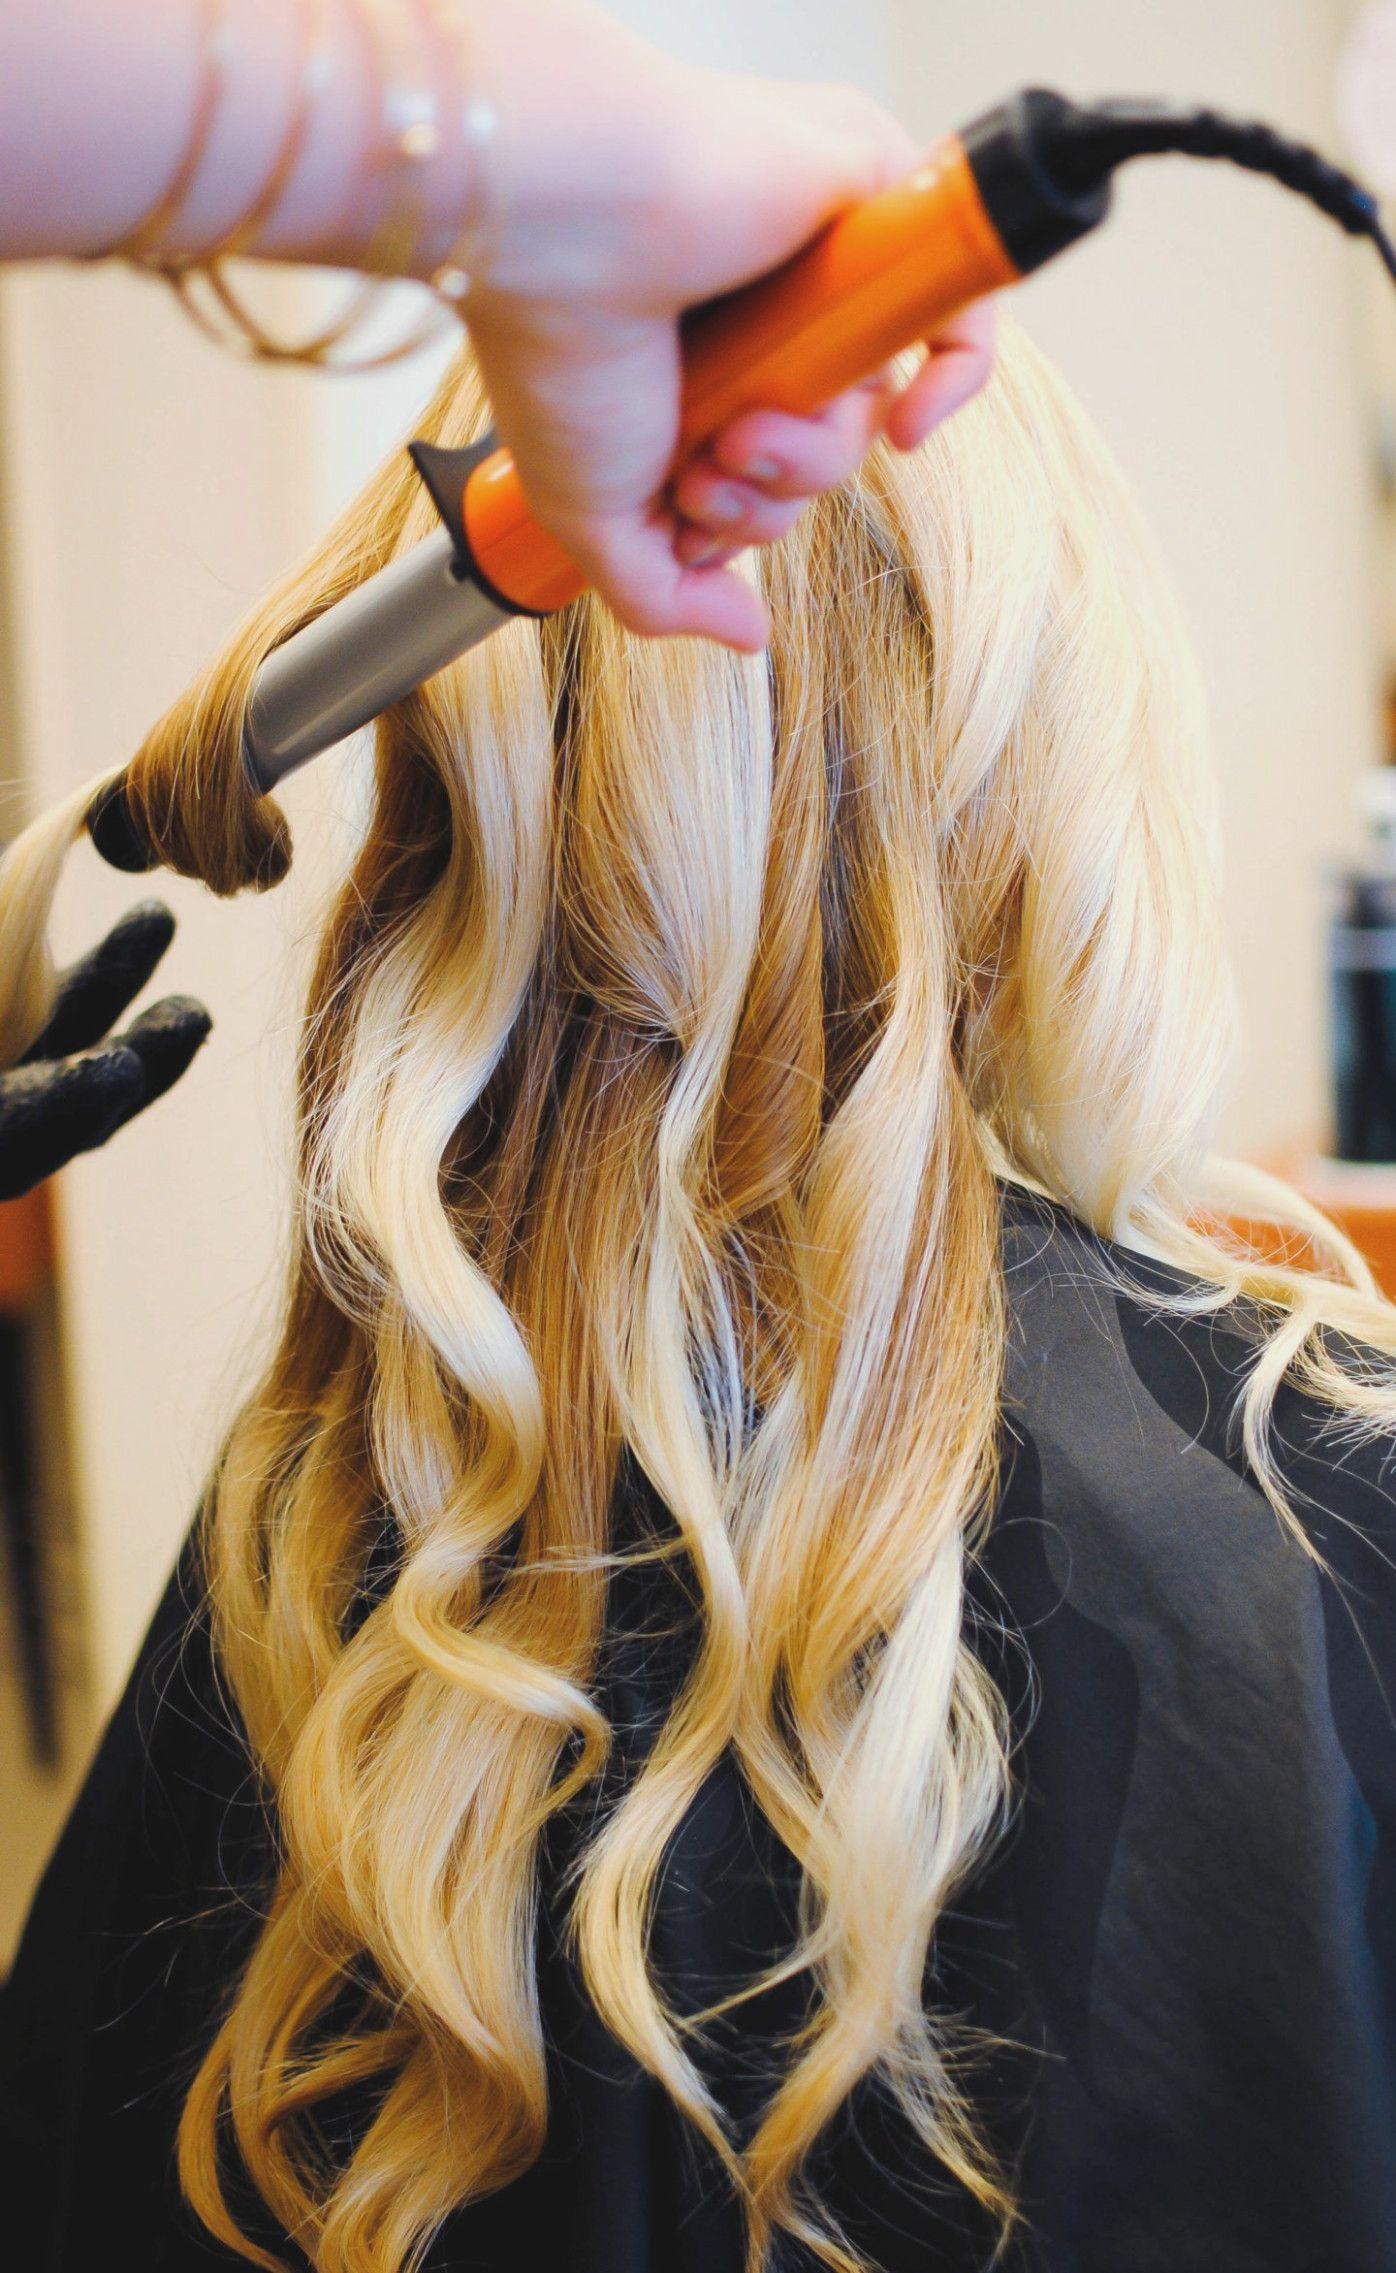 Grunner Til At Hair Cuttery Haircut Blir Mer Populaert I Det Siste Tiaret Hair Cuttery Haircut Cuttery Grunner Haircut Popu Hair Cuttery Hair Hair Styles